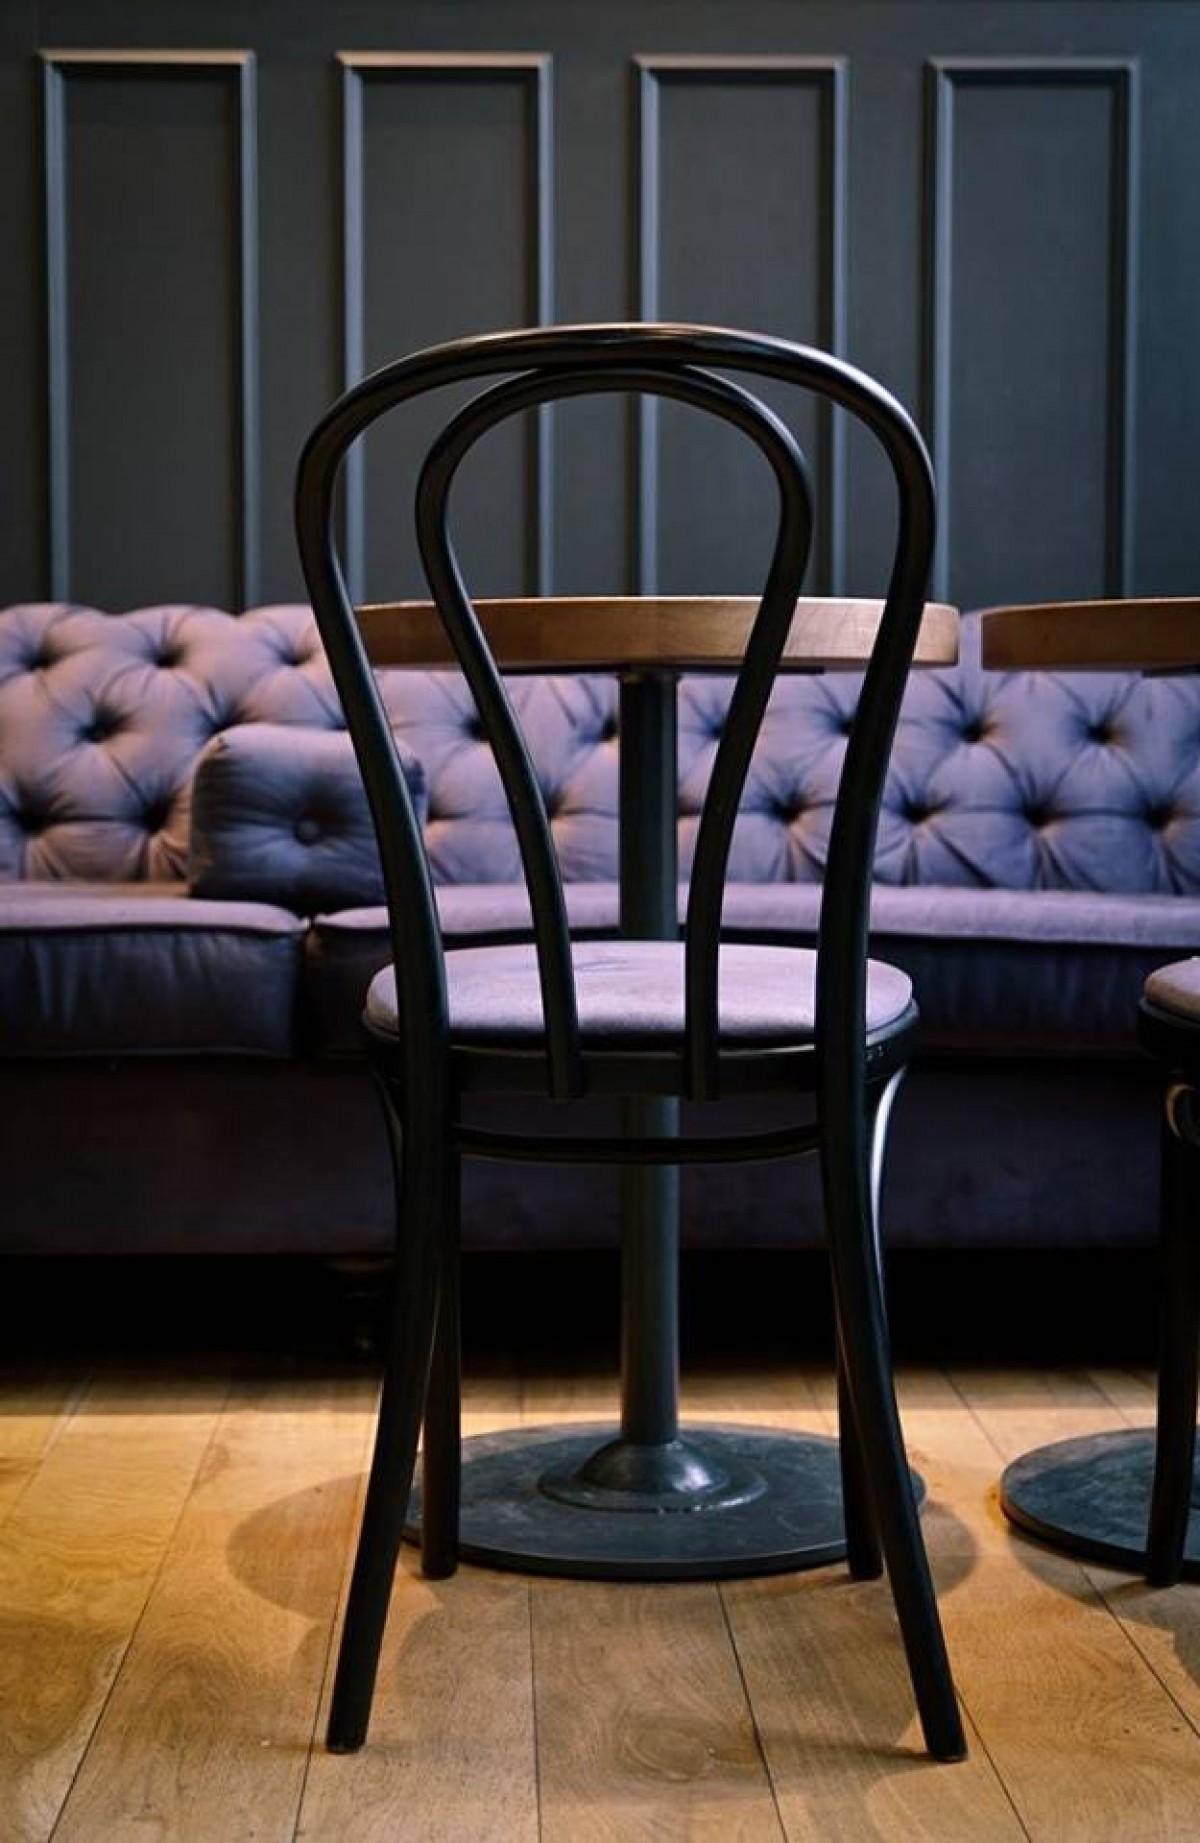 bistro 2 mobilier de bar p m furniture mobilier horeca la comanda si design de interior. Black Bedroom Furniture Sets. Home Design Ideas